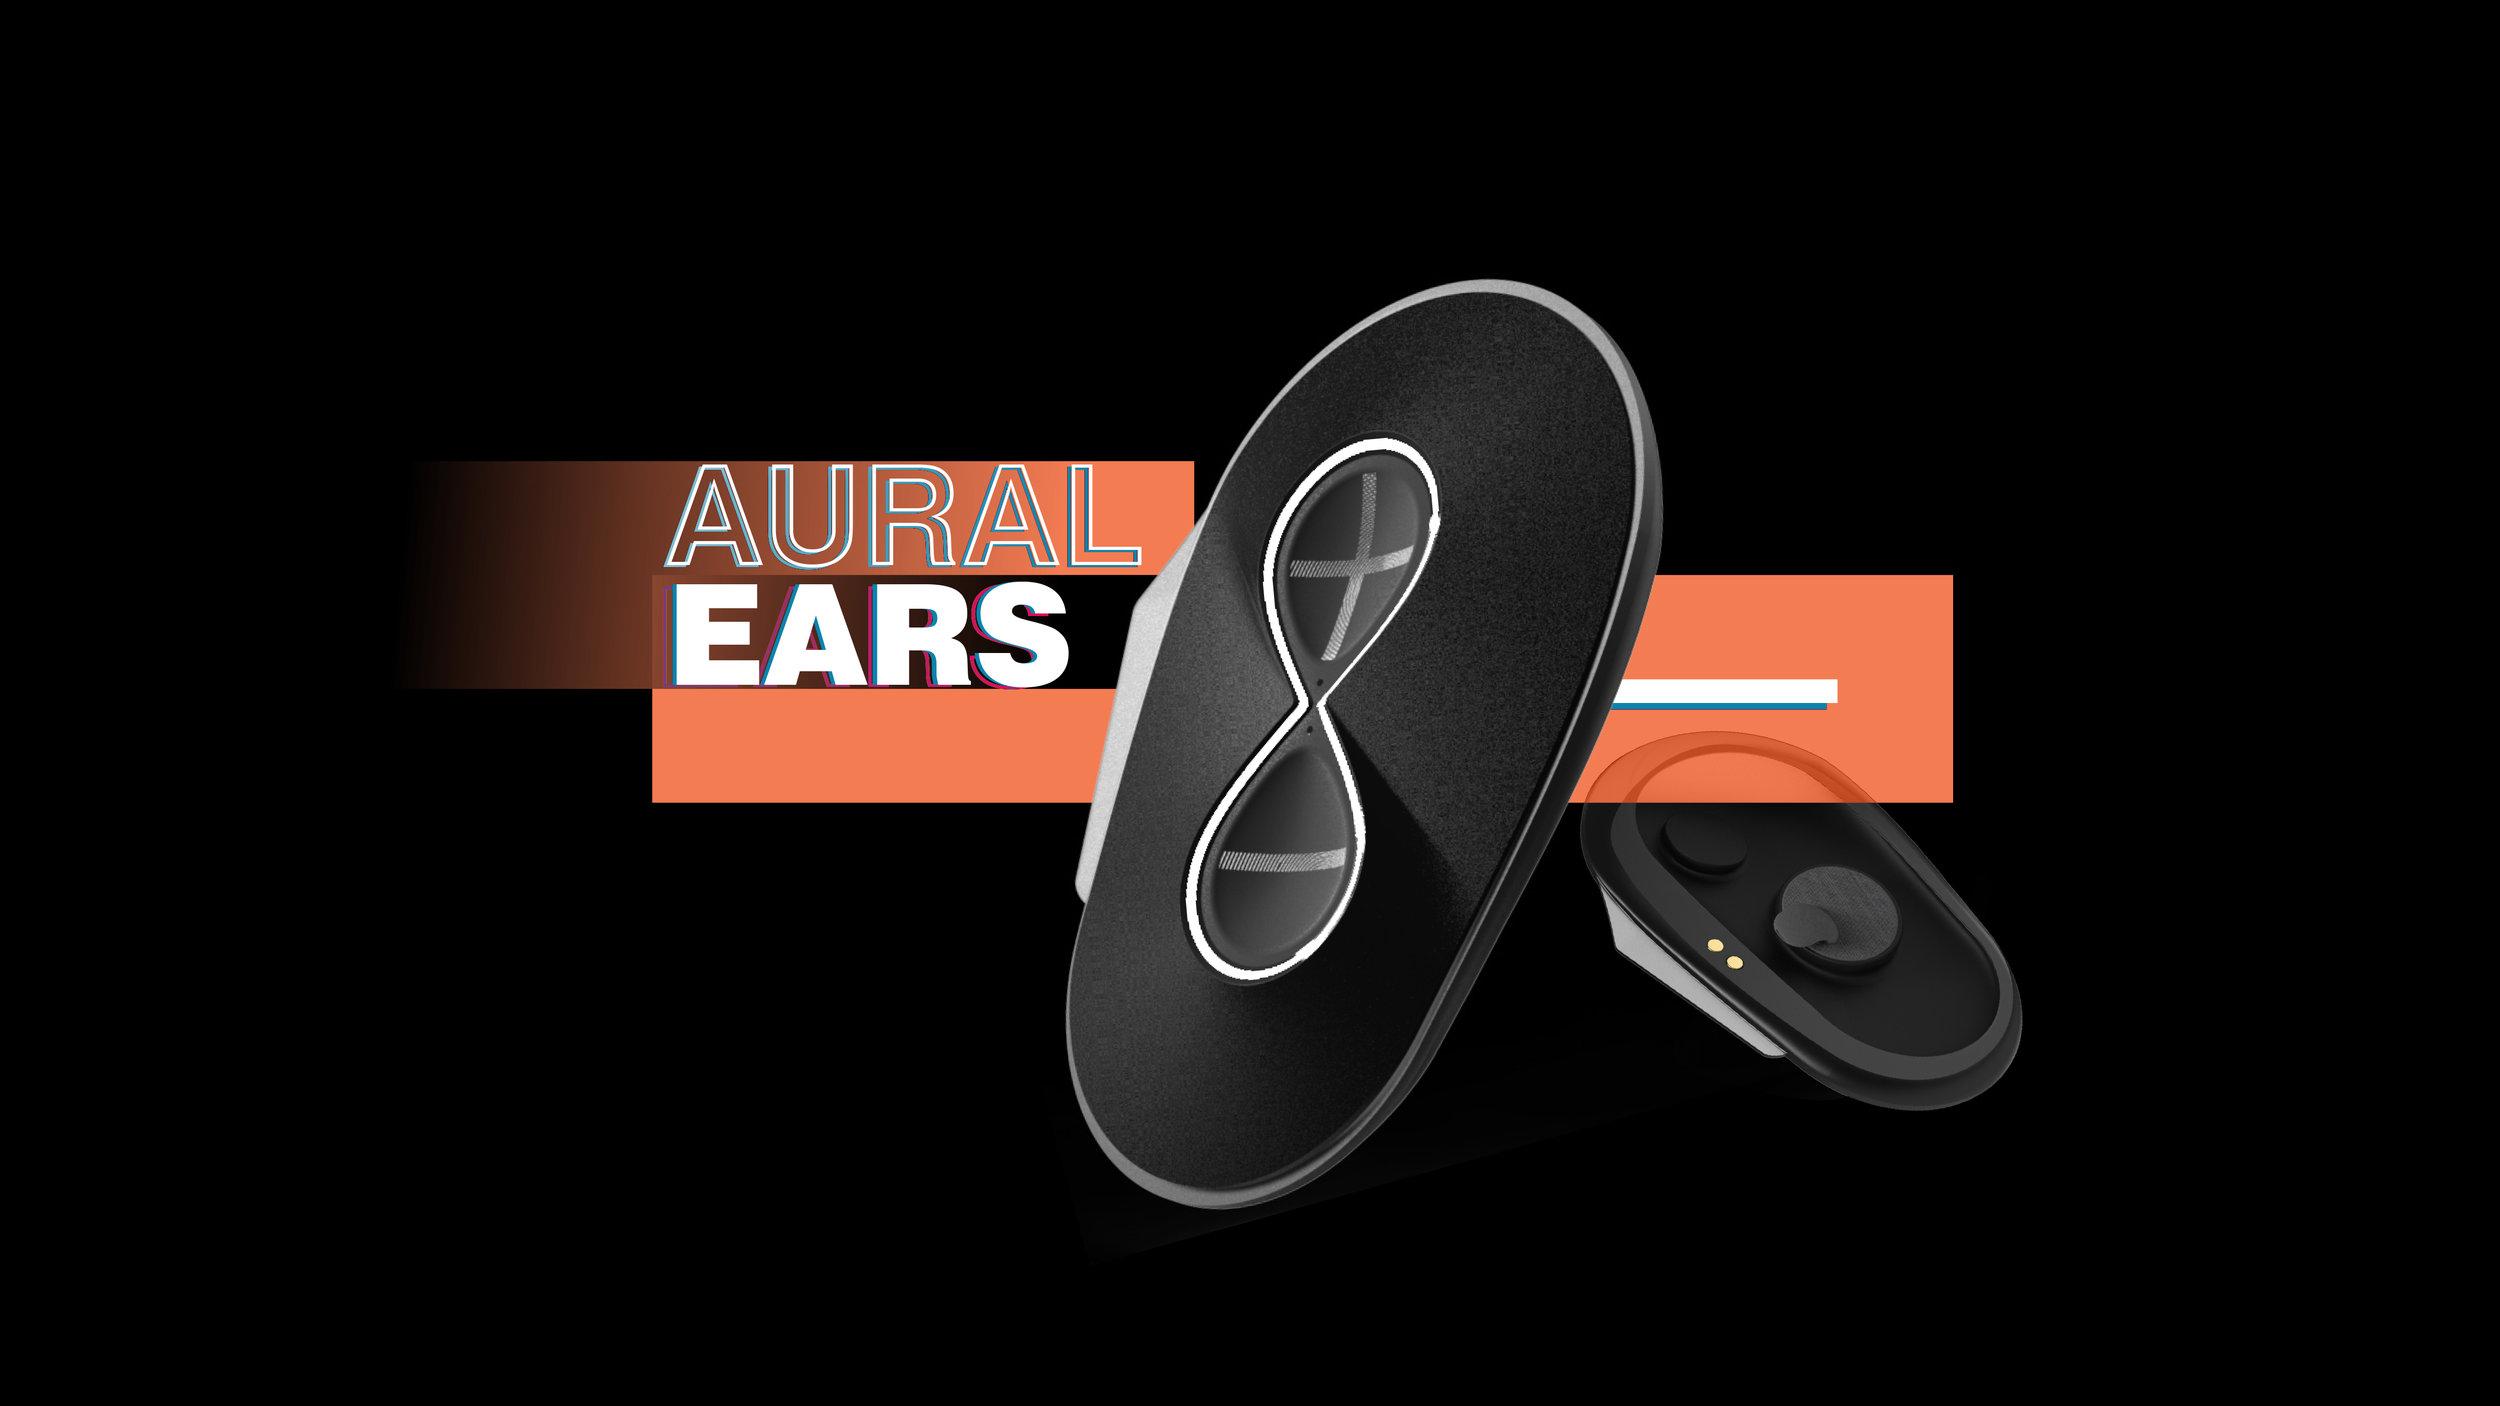 Aural Ears-1.jpg